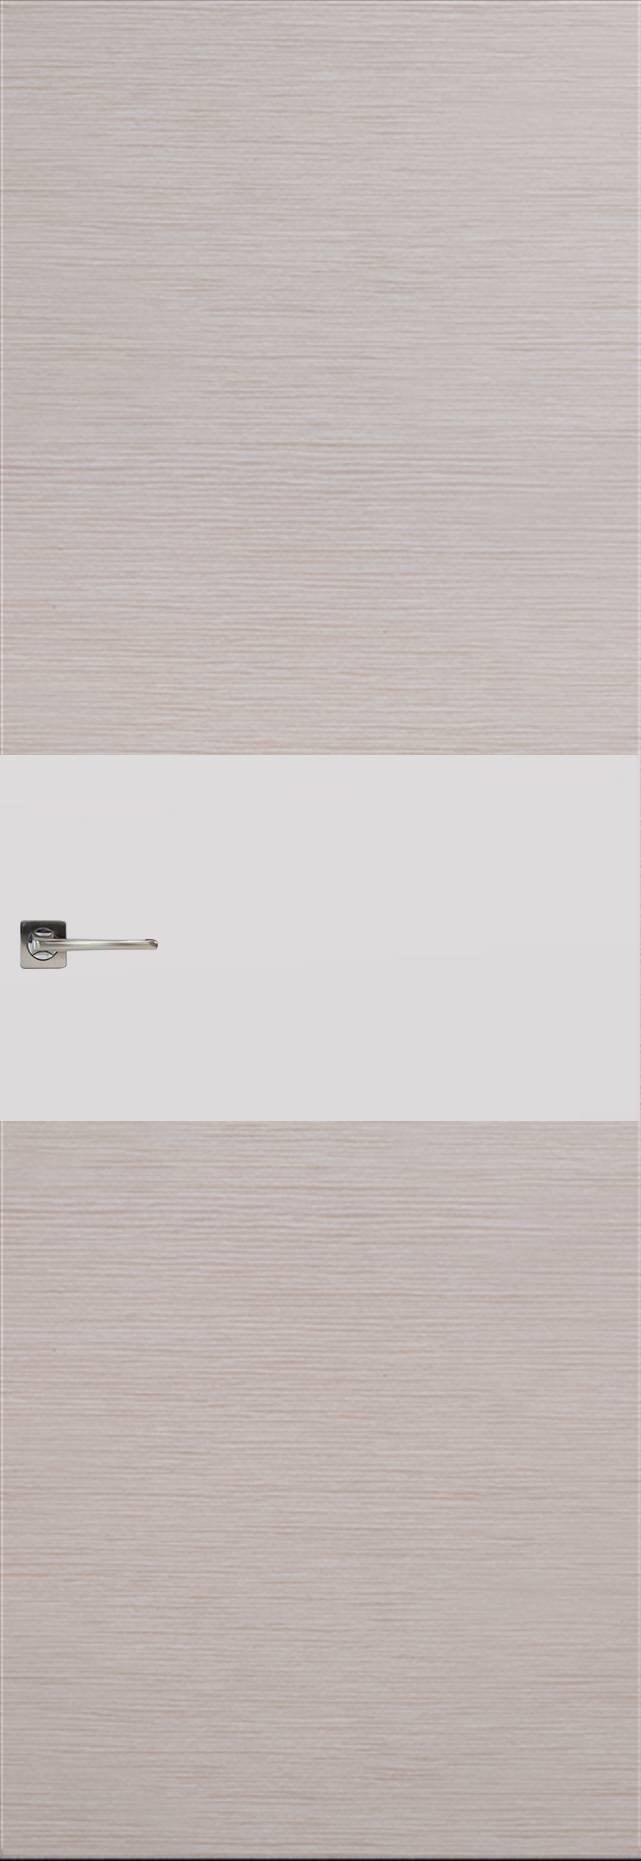 Tivoli Е-4 Невидимка цвет - Дымчатый дуб Без стекла (ДГ)